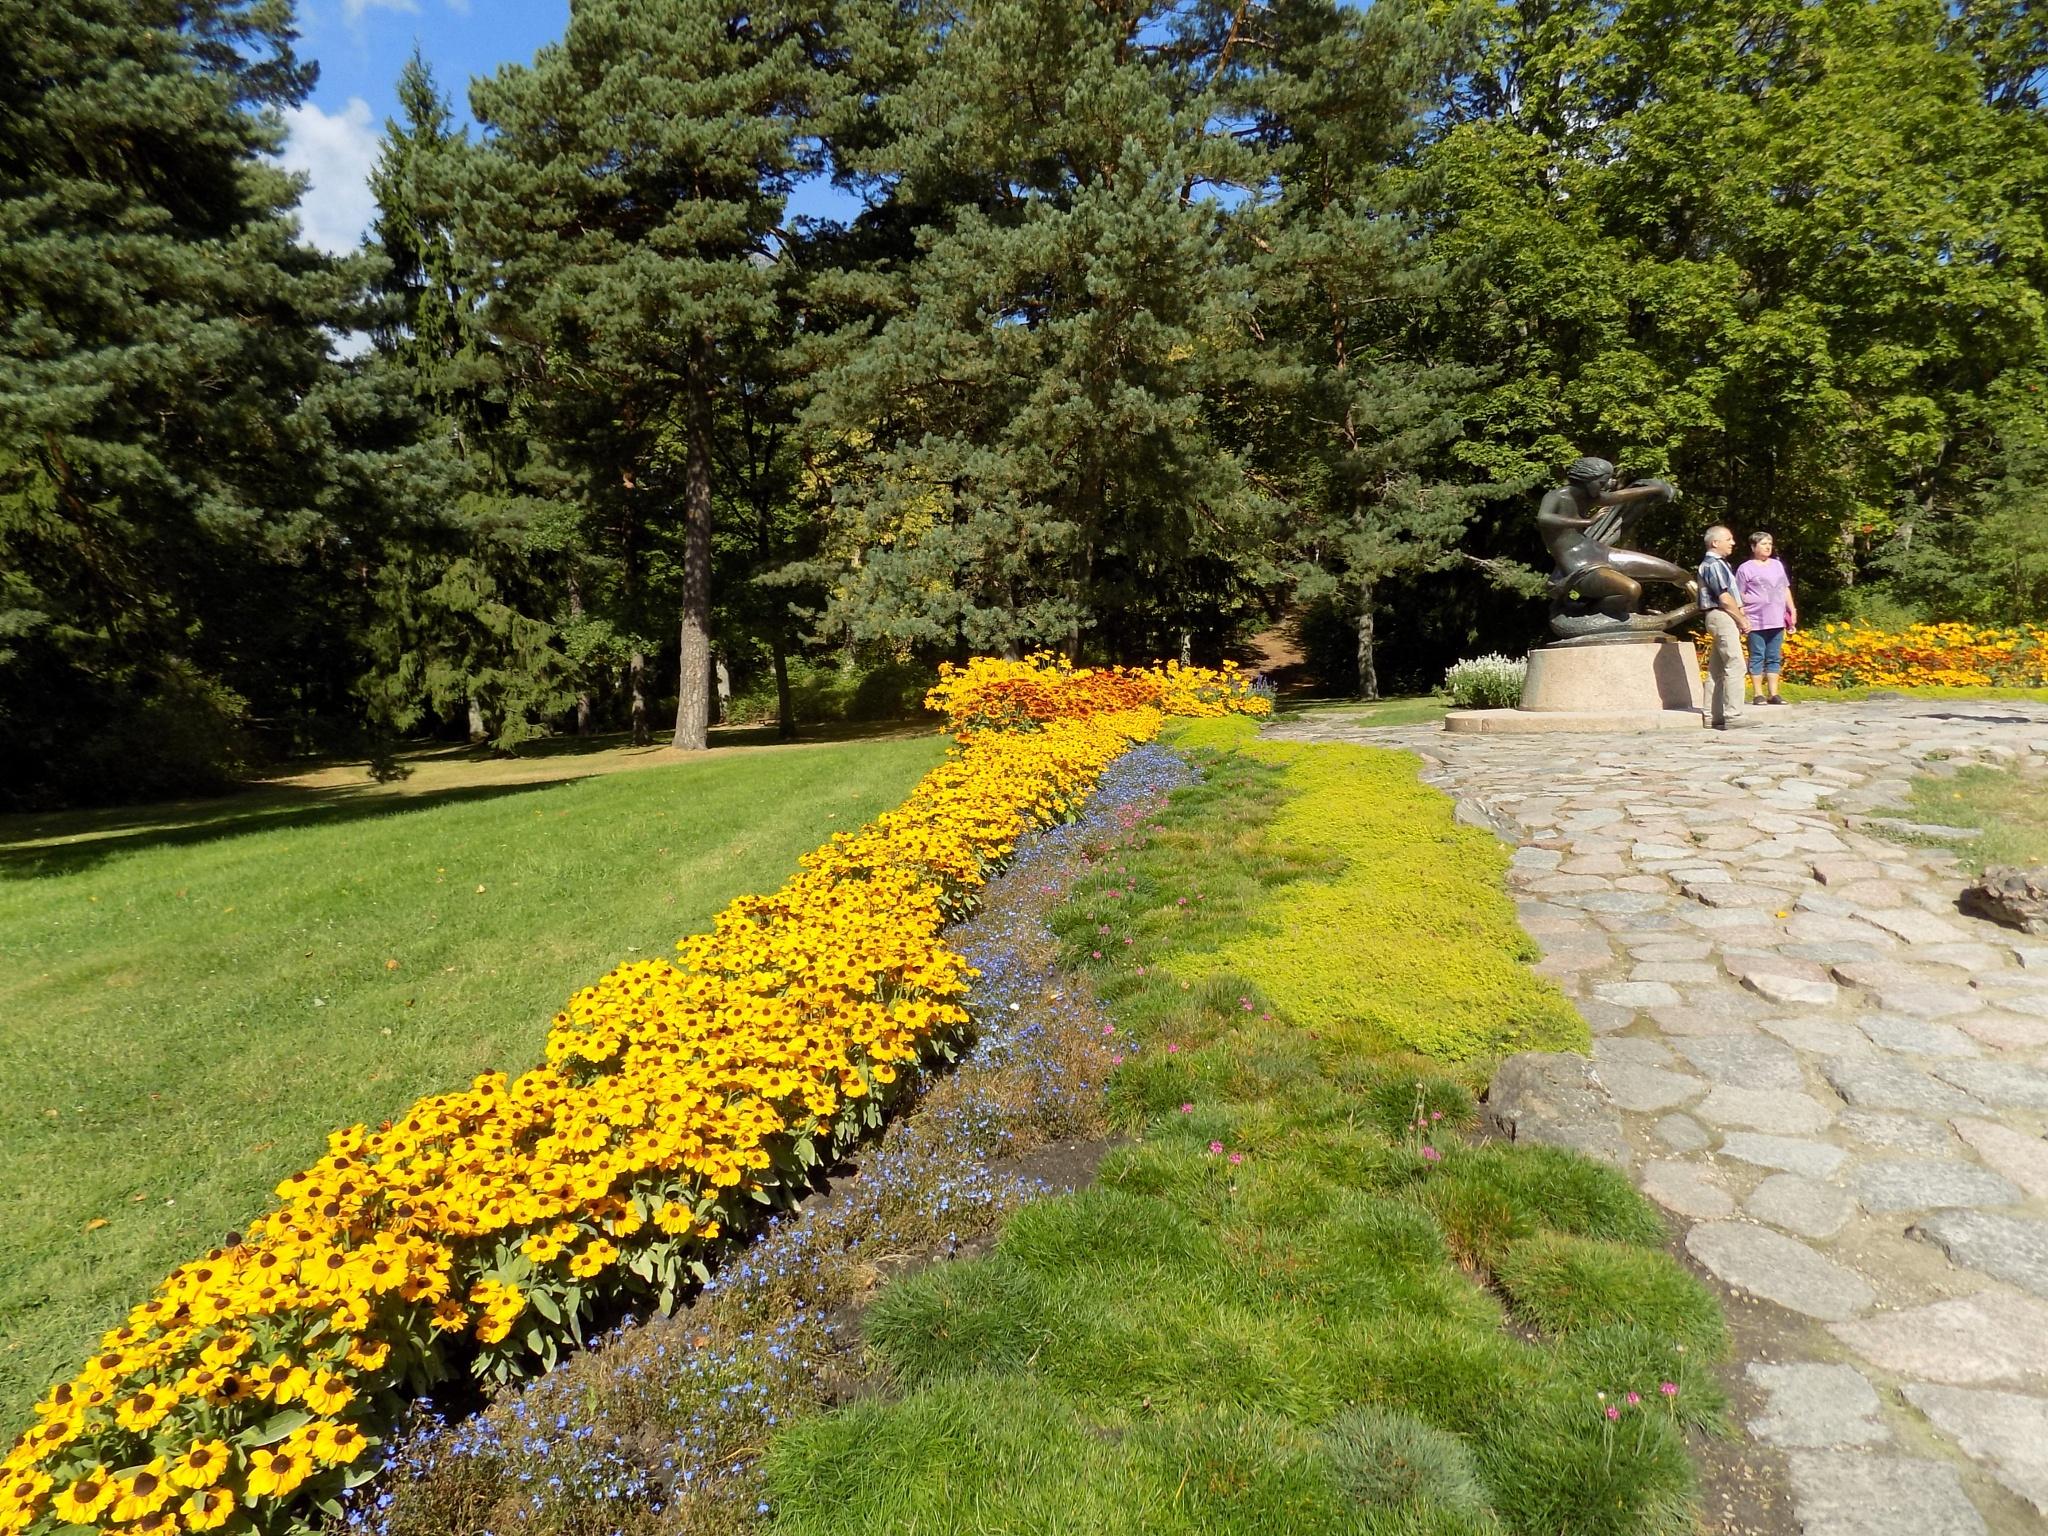 Flowers in the park by uzkuraitiene62